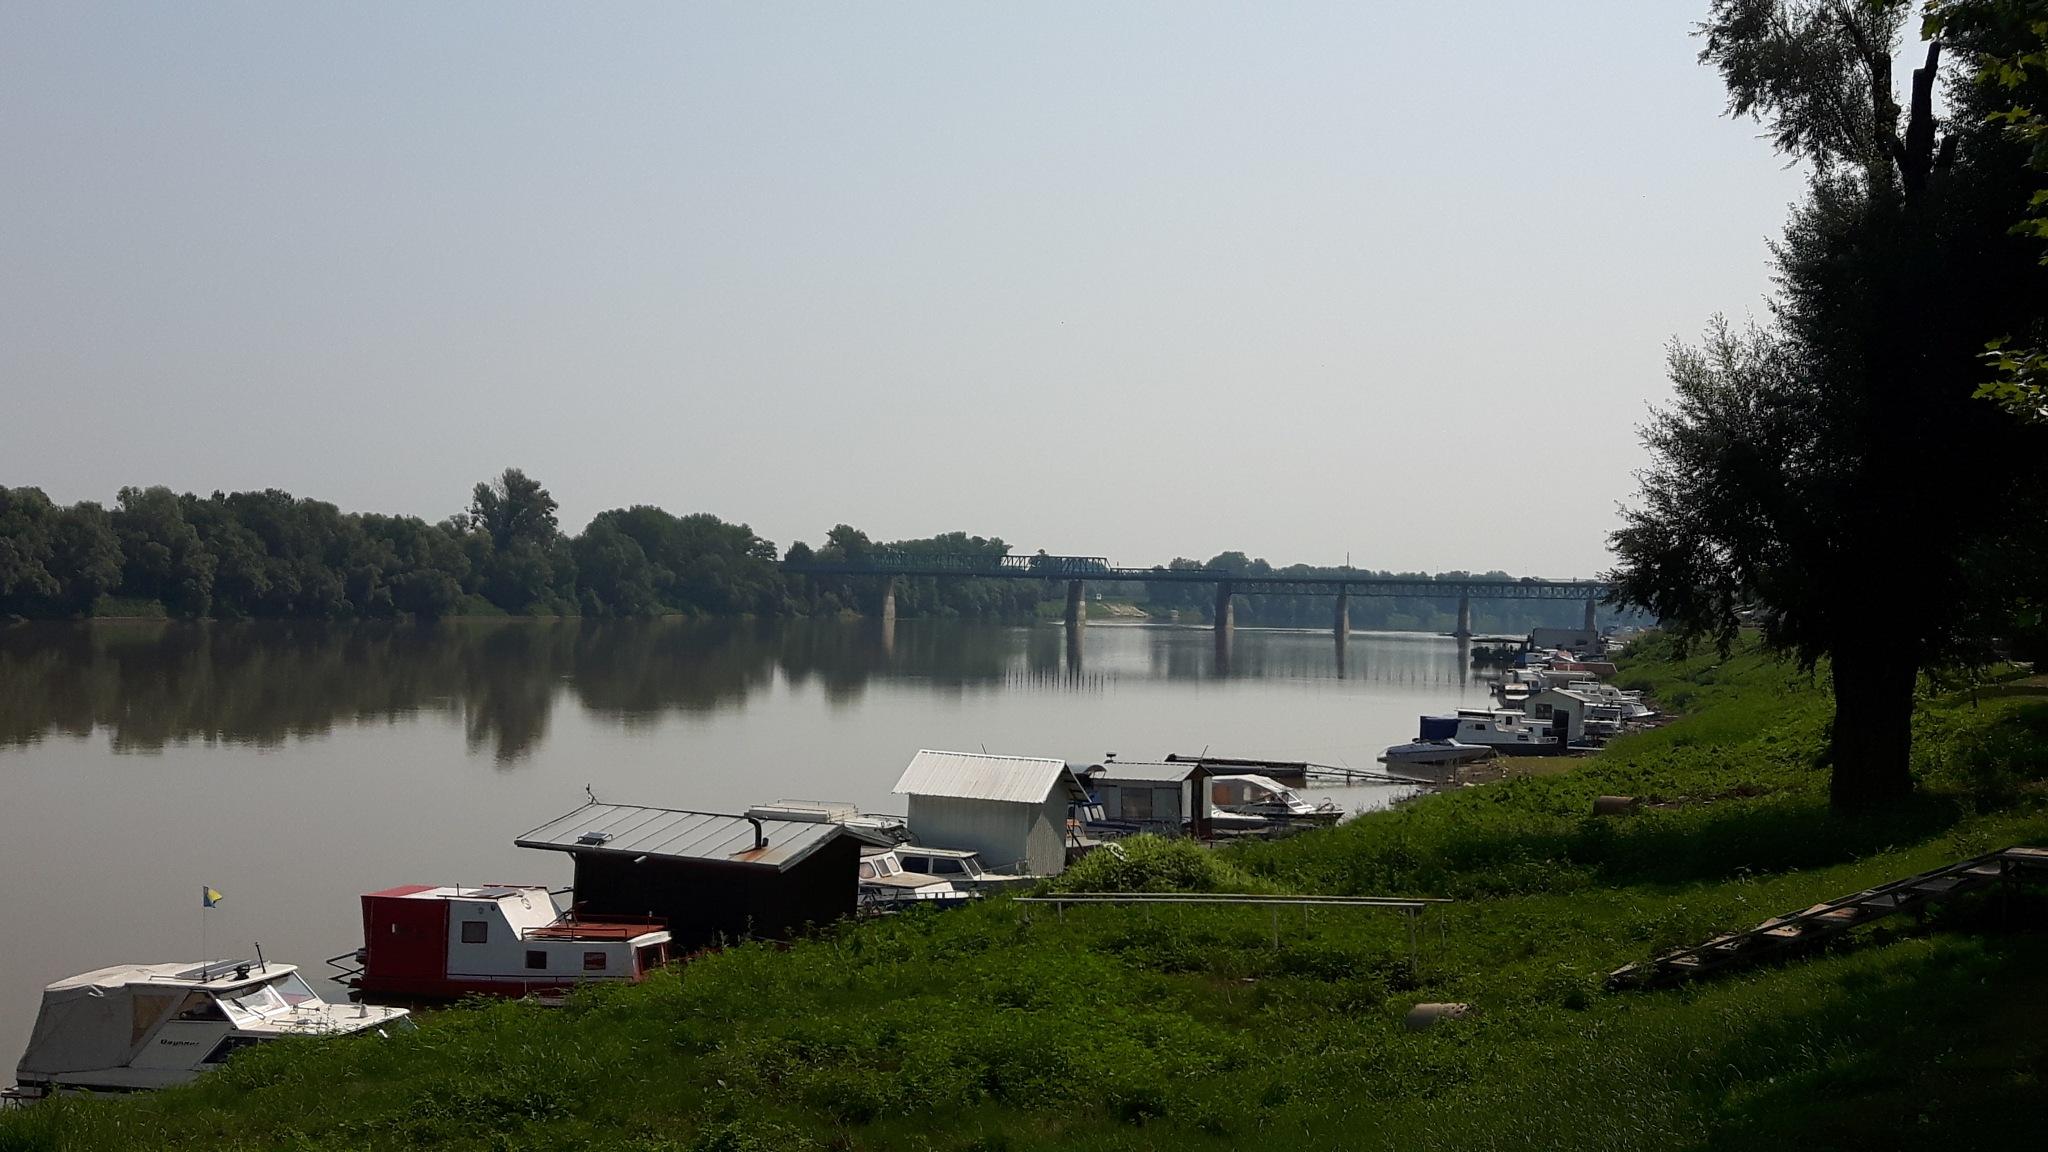 River Sava north natural border betwee Bosnia this bank and Croatia across the river by Mevludin_Hasanovic